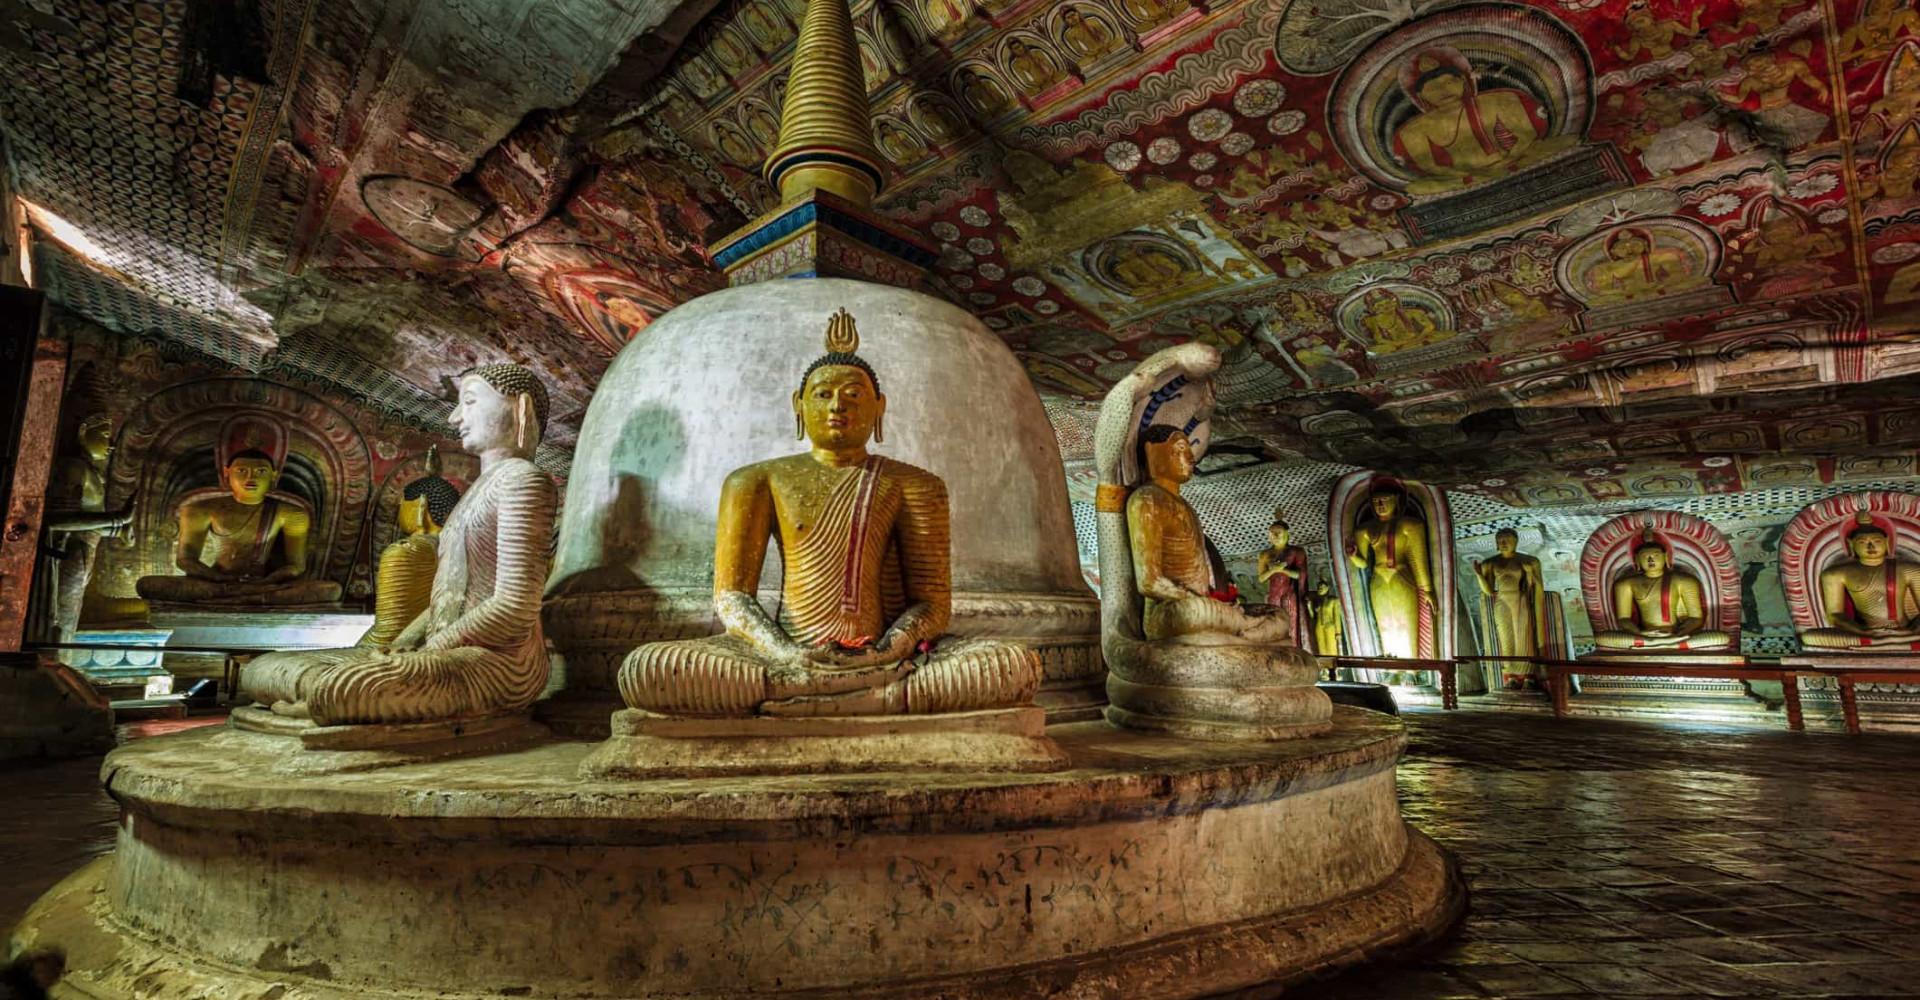 Utrolige underjordiske turistattraktioner